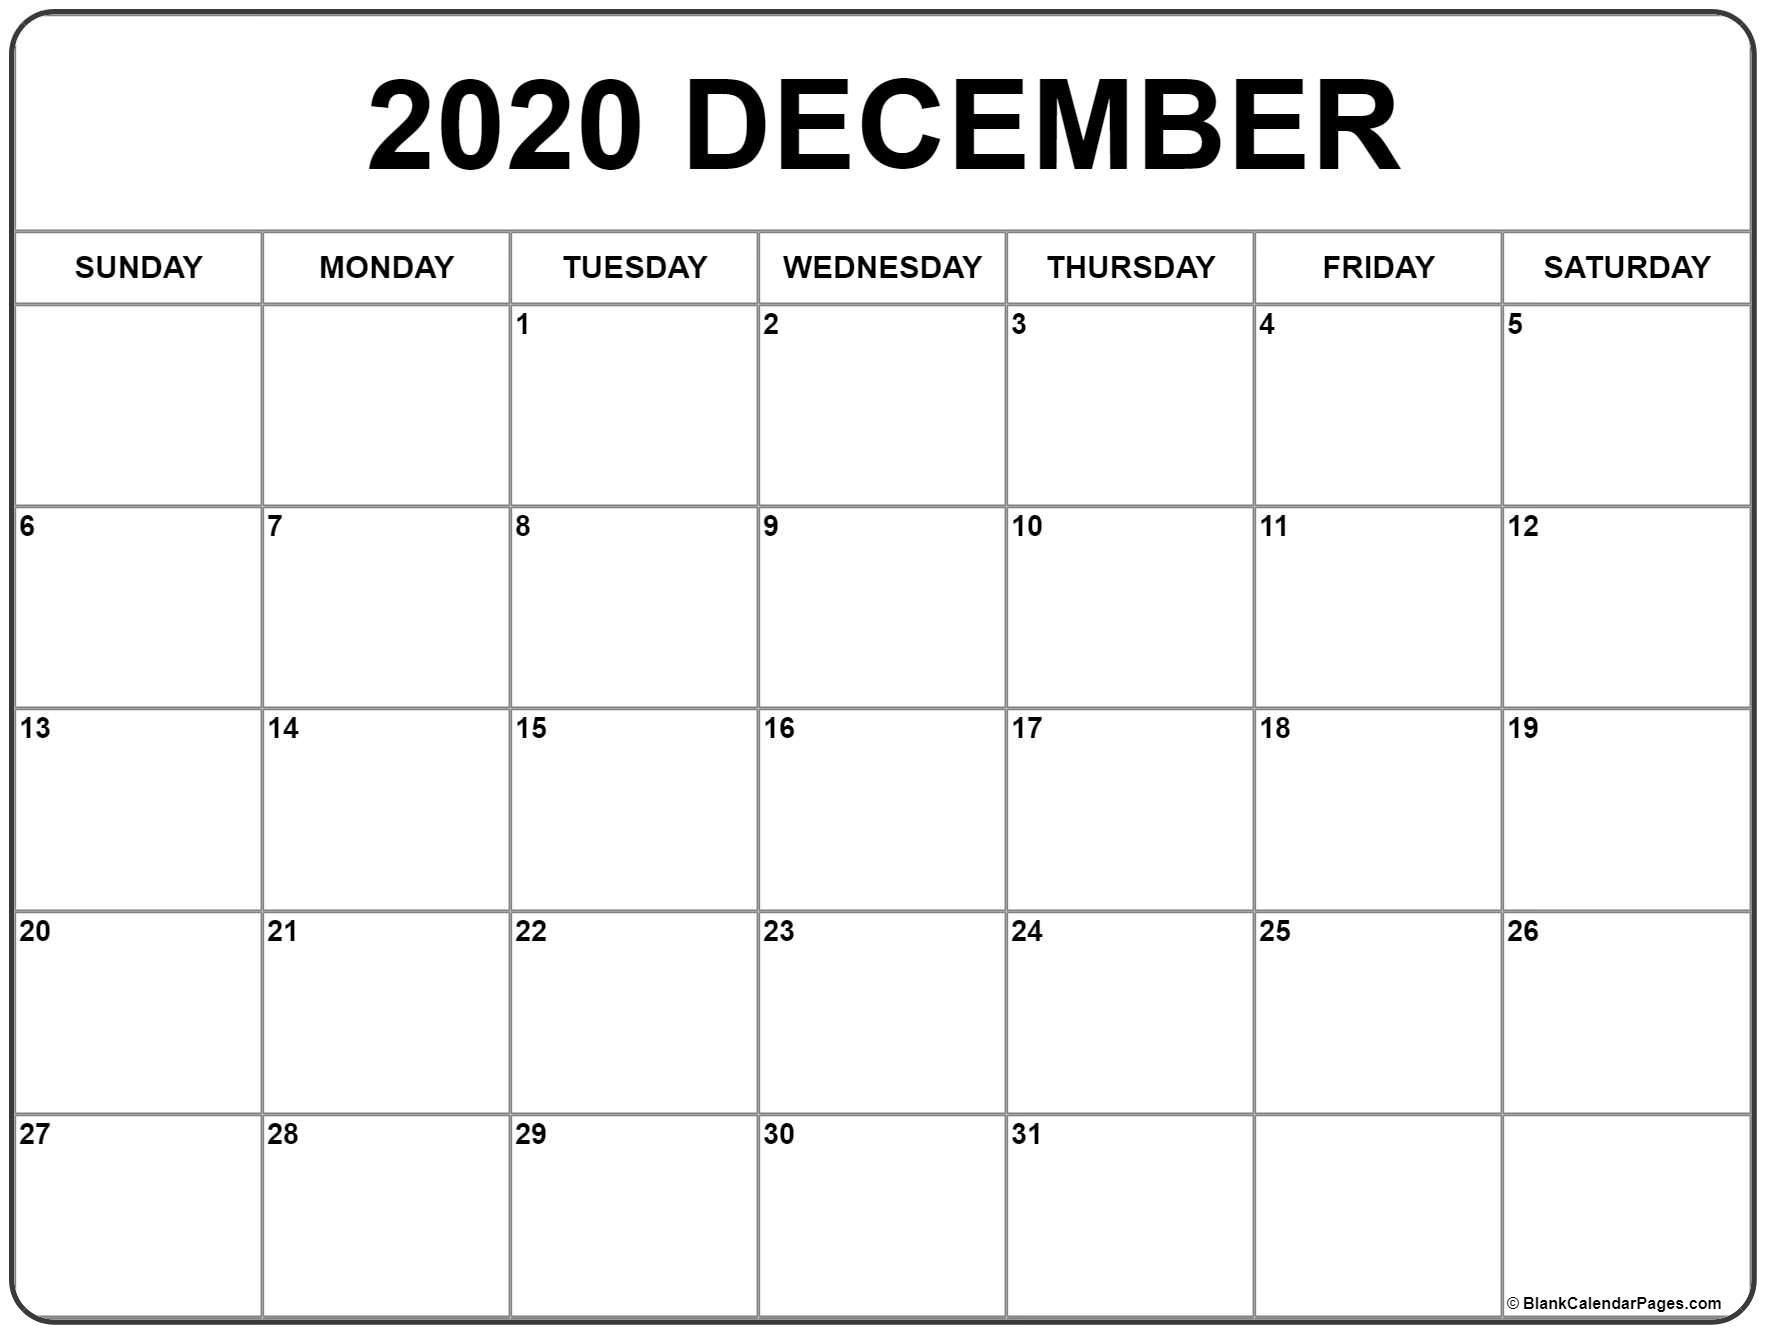 Blank Calendar December 2020 - Togo.wpart.co